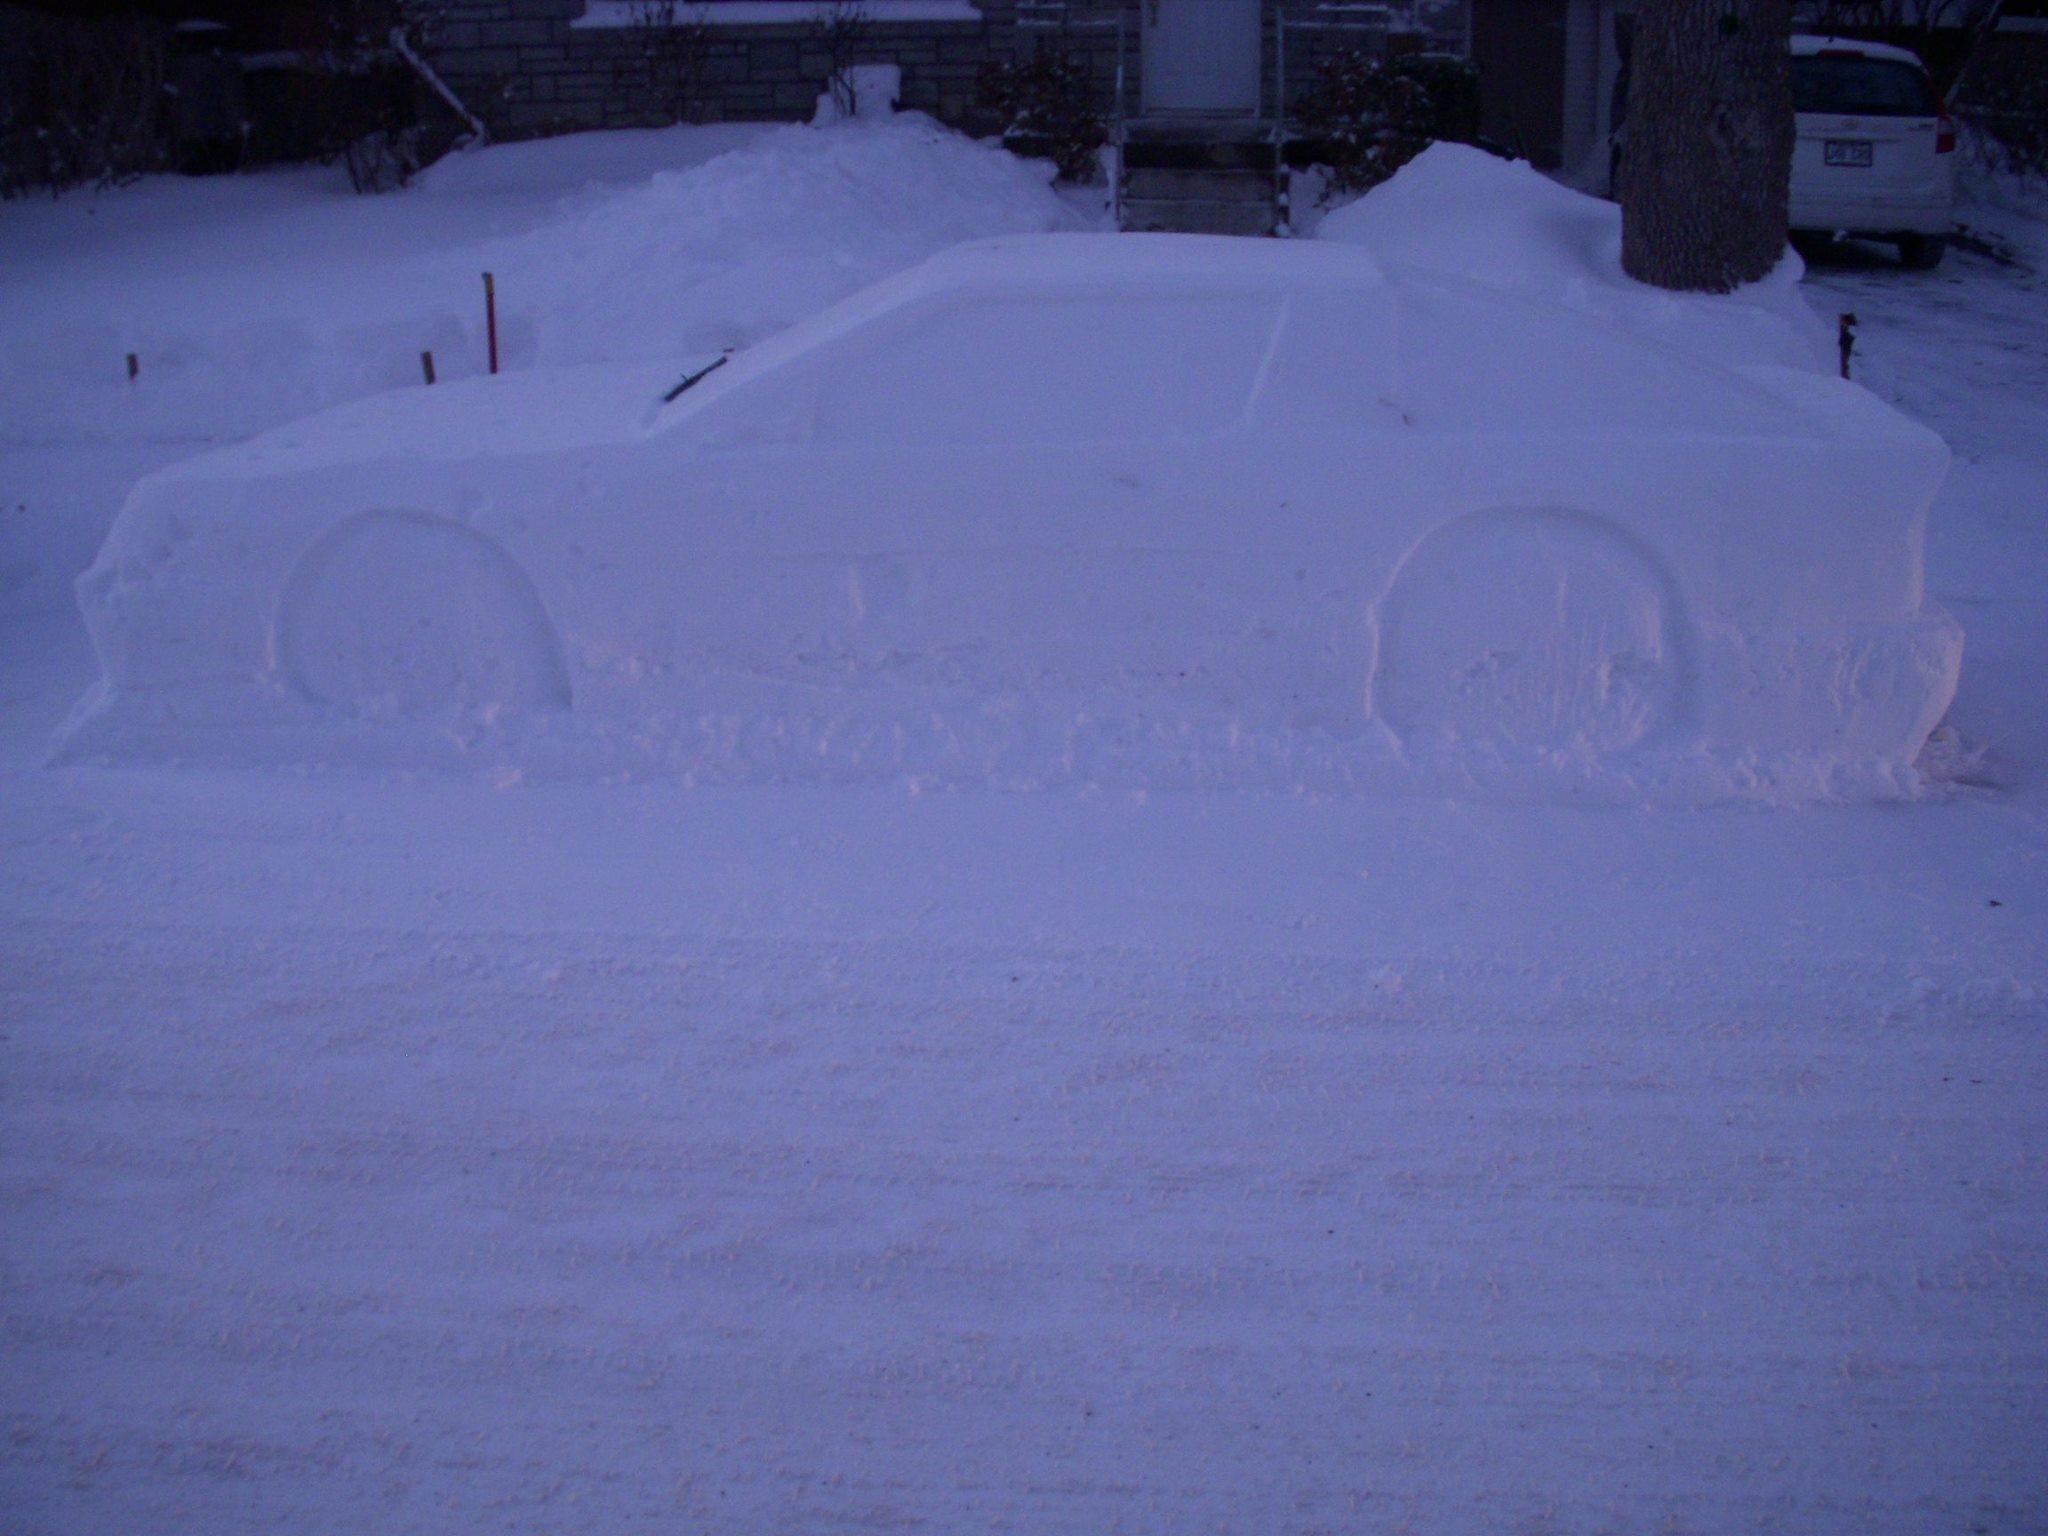 Toyota Supra snow (8)